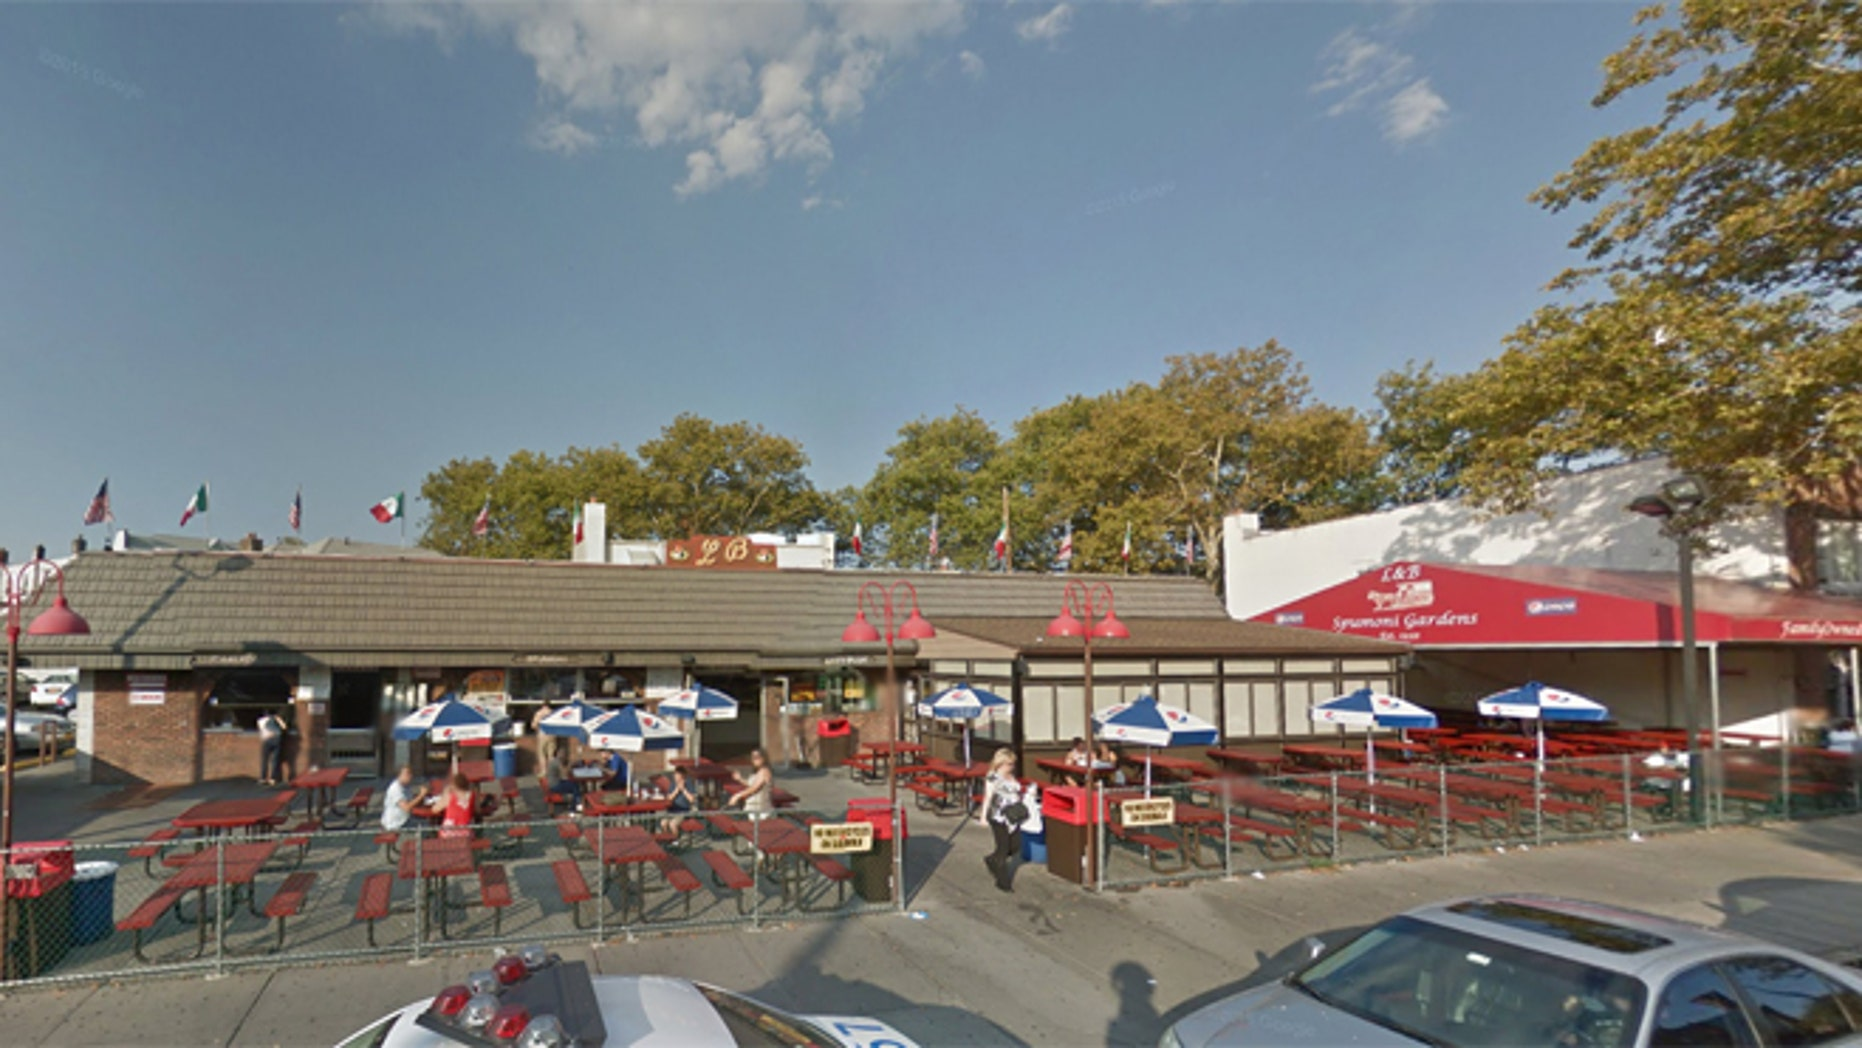 L&B Spumoni Gardens in Brooklyn, N.Y. (Google Street View)